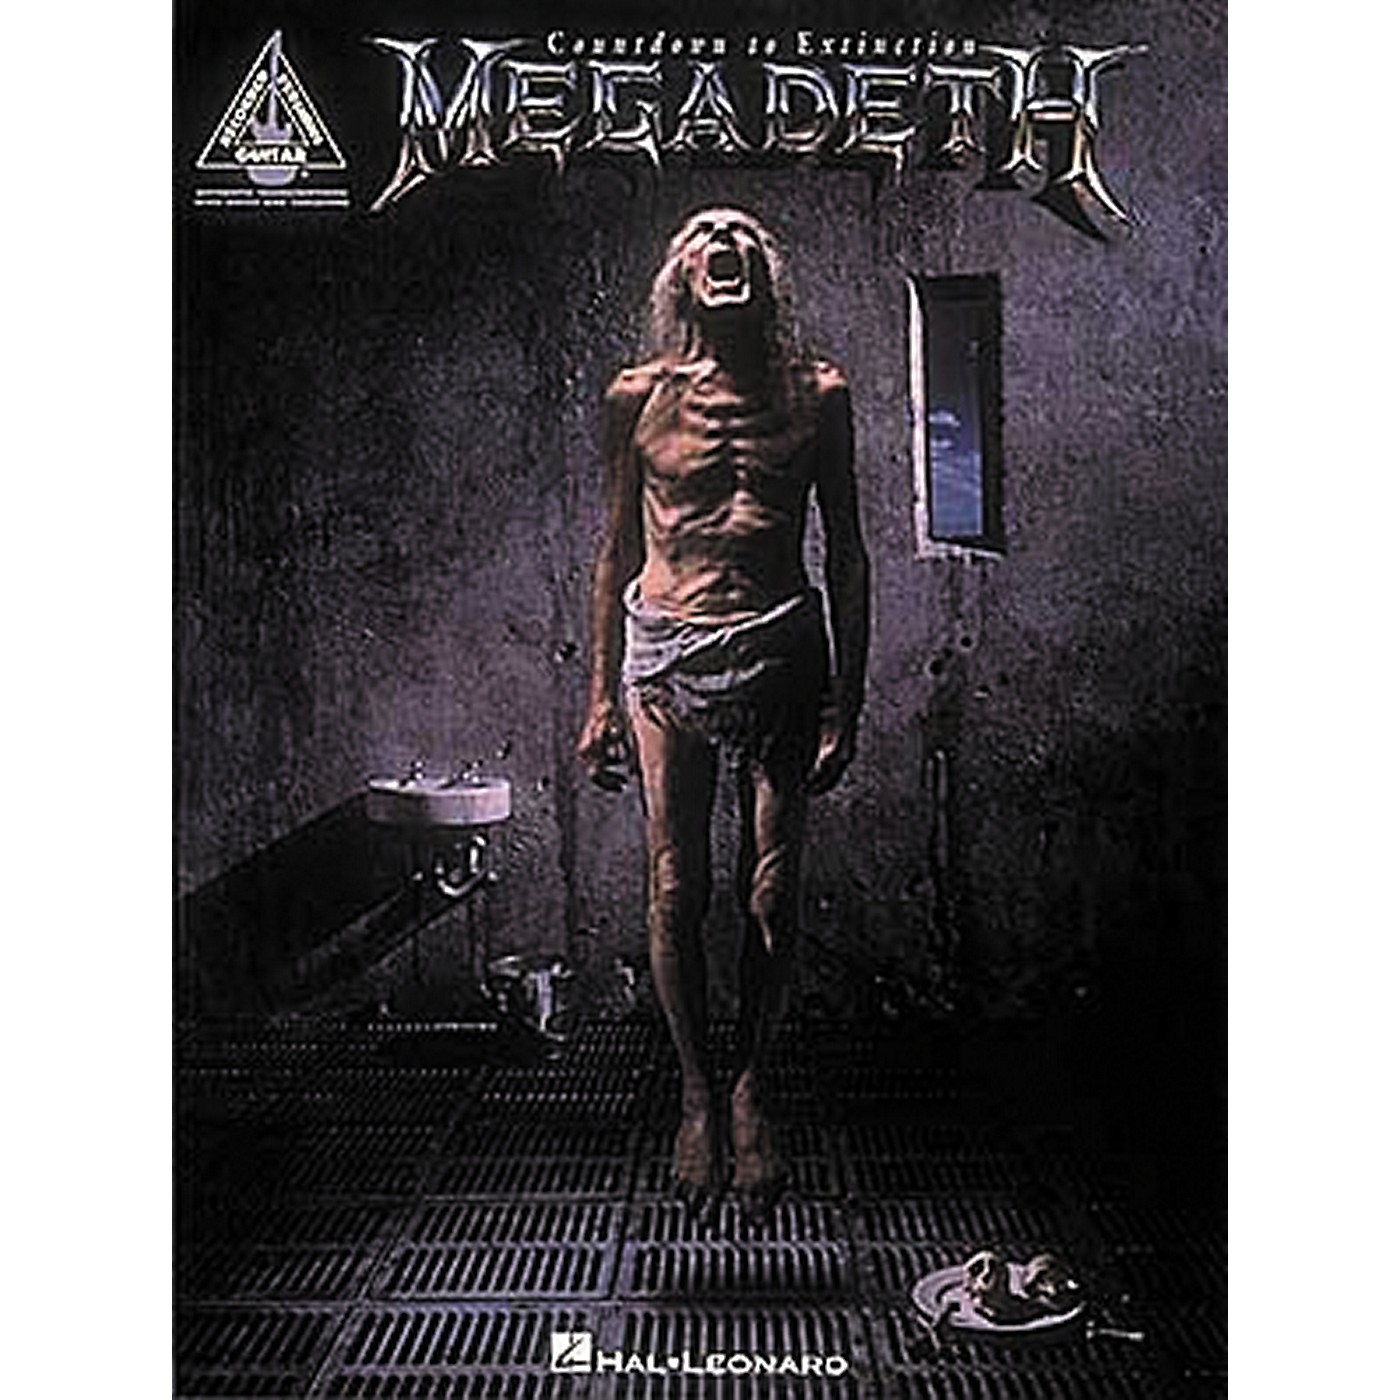 Hal Leonard Megadeth Countdown to Extinction Guitar Tab Songbook thumbnail